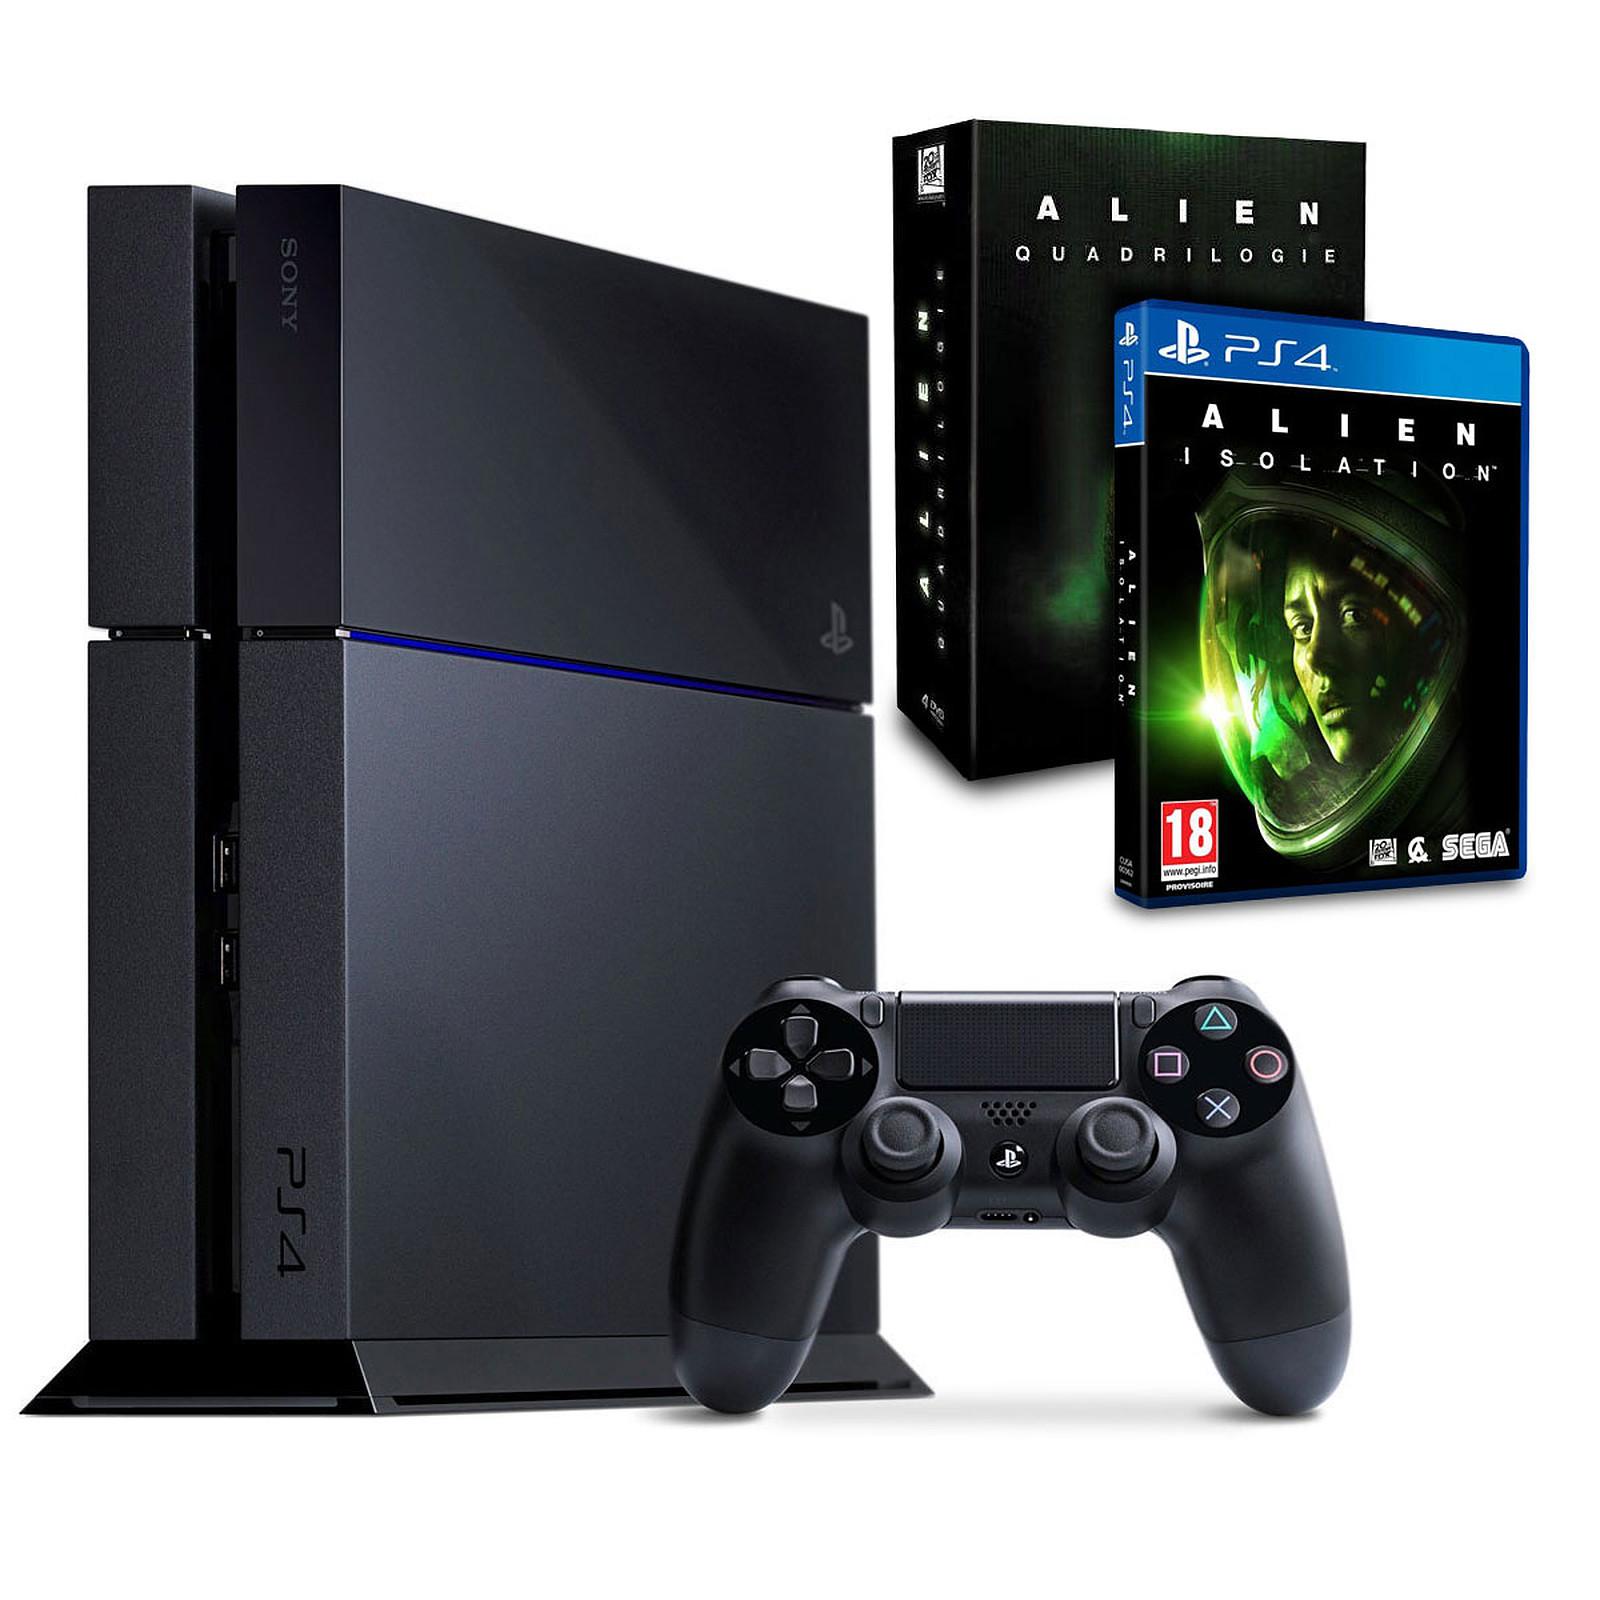 Sony PlayStation 4 Alien Saga (1 To)